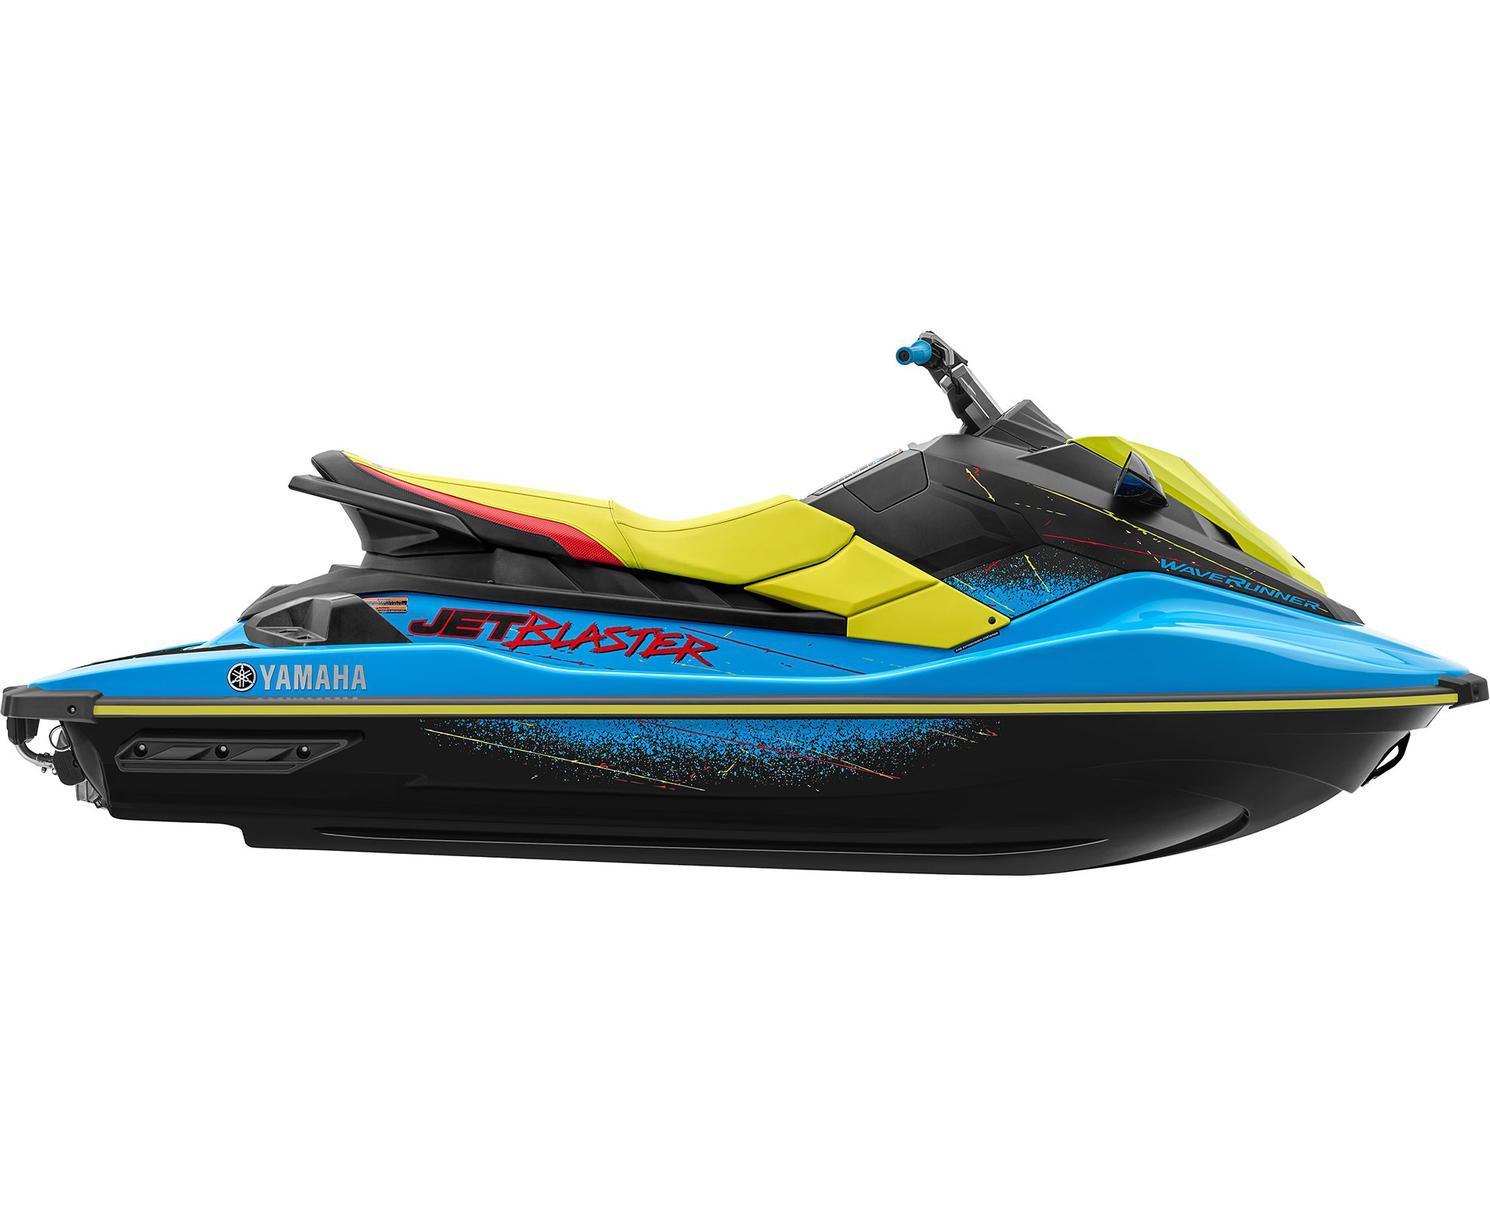 Yamaha Jet Blaster Cyan/Jaune Limette 2022